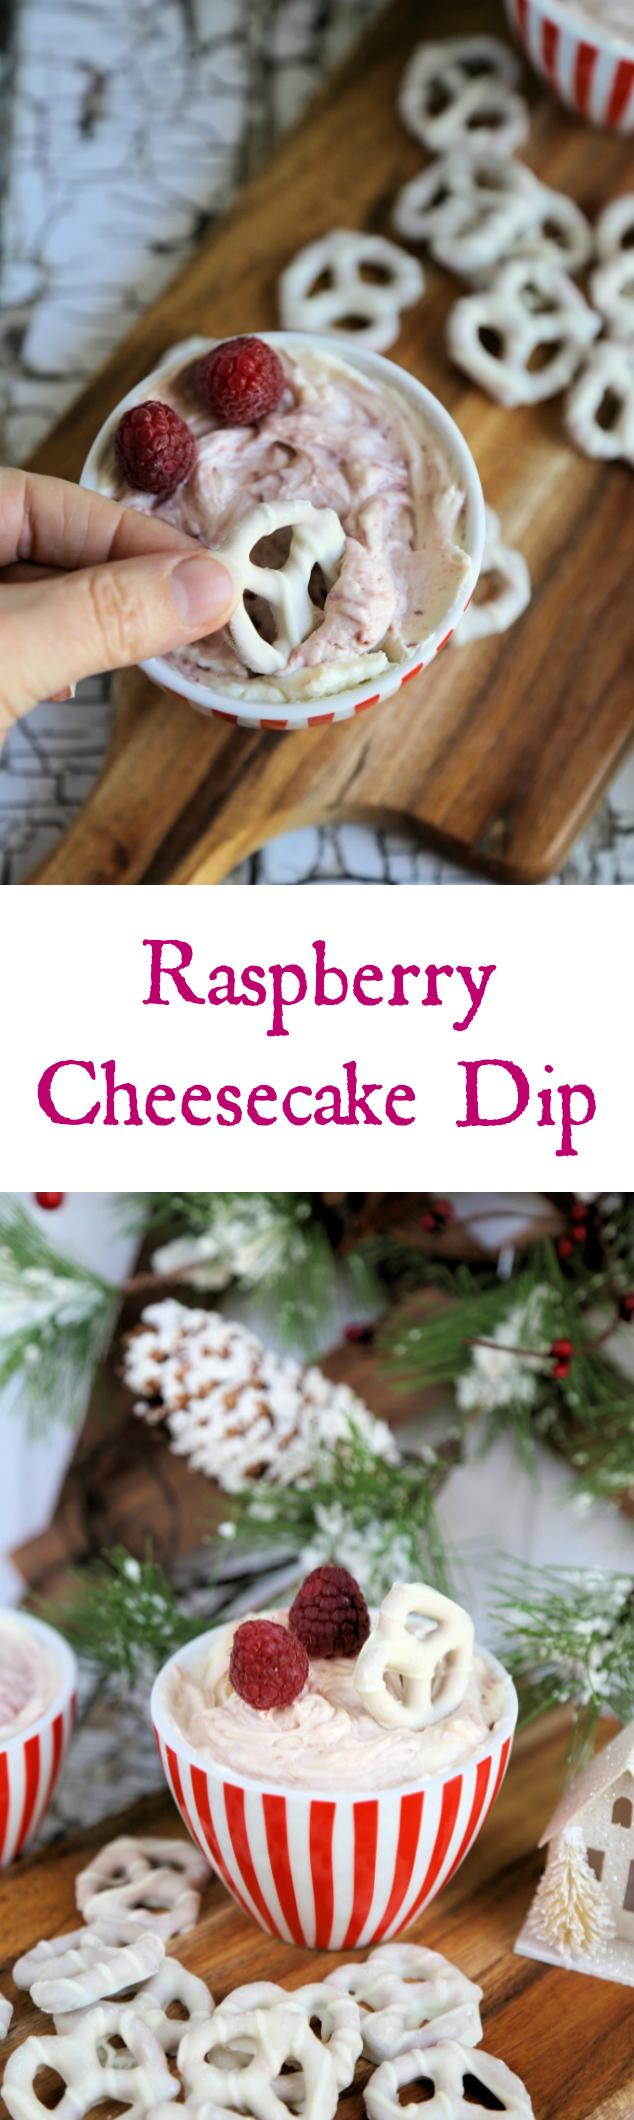 Raspberry Cheesecake Dip Recipe